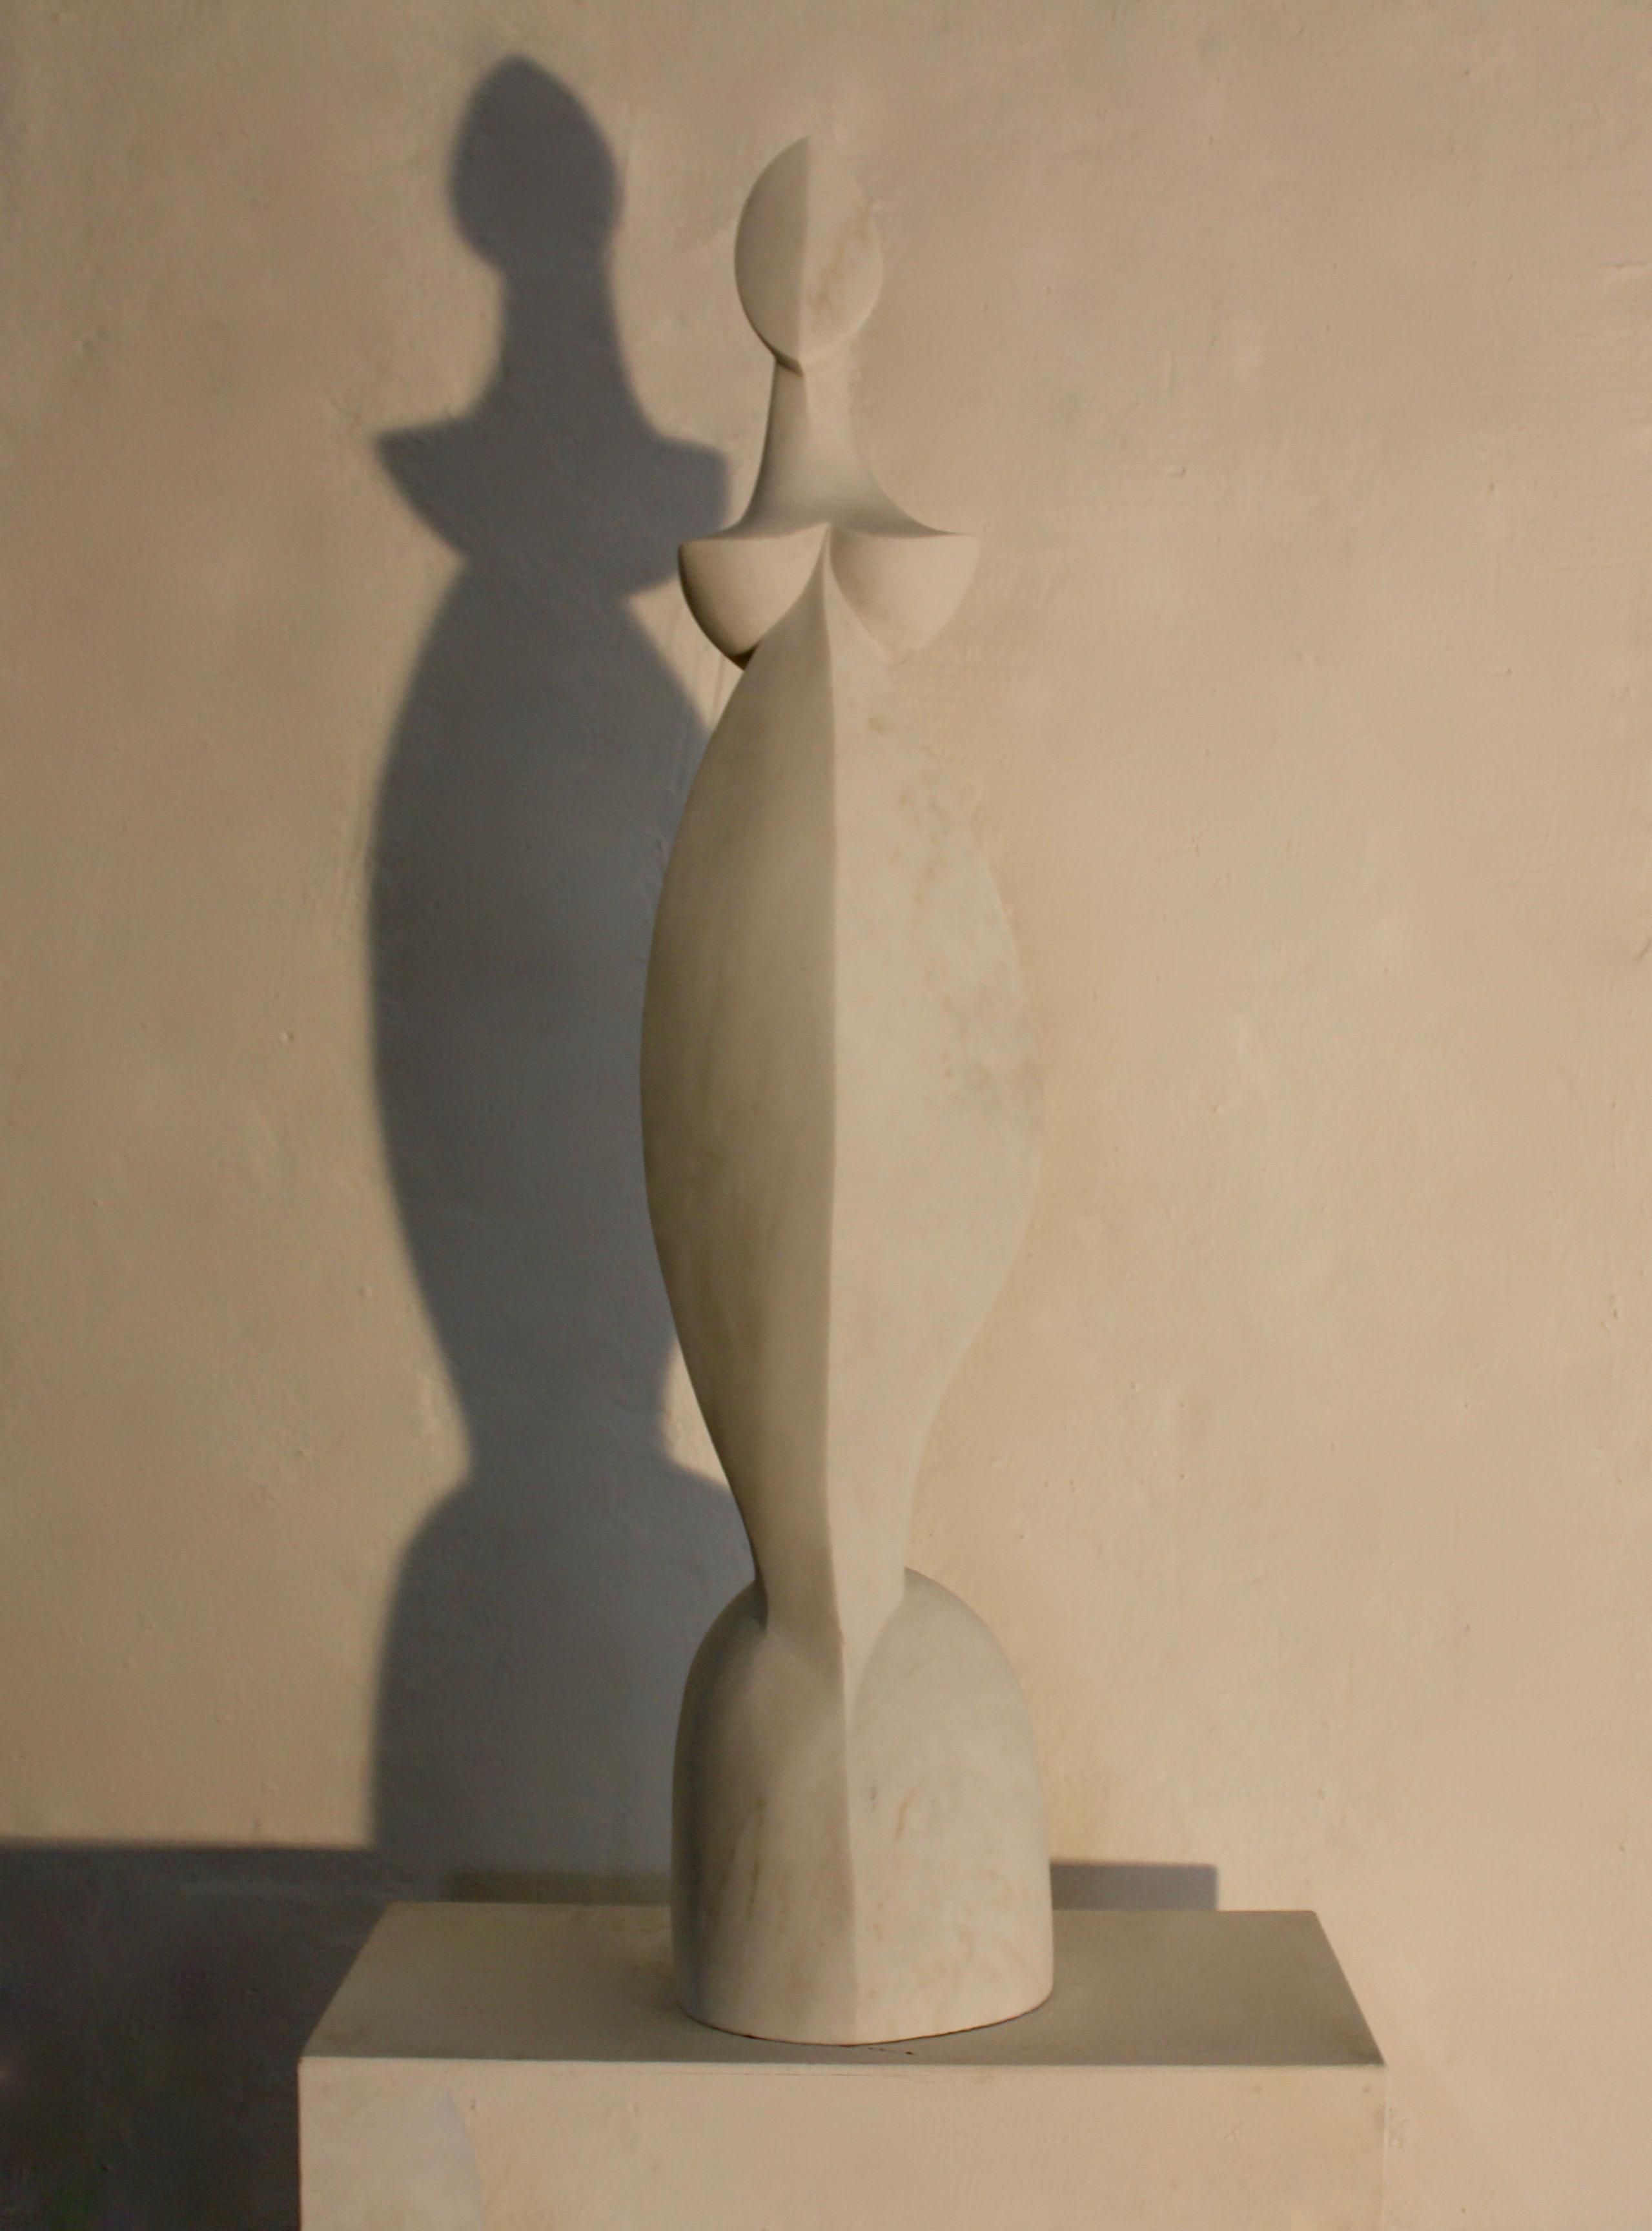 marble sculpture, woman figure, Carrara white marble